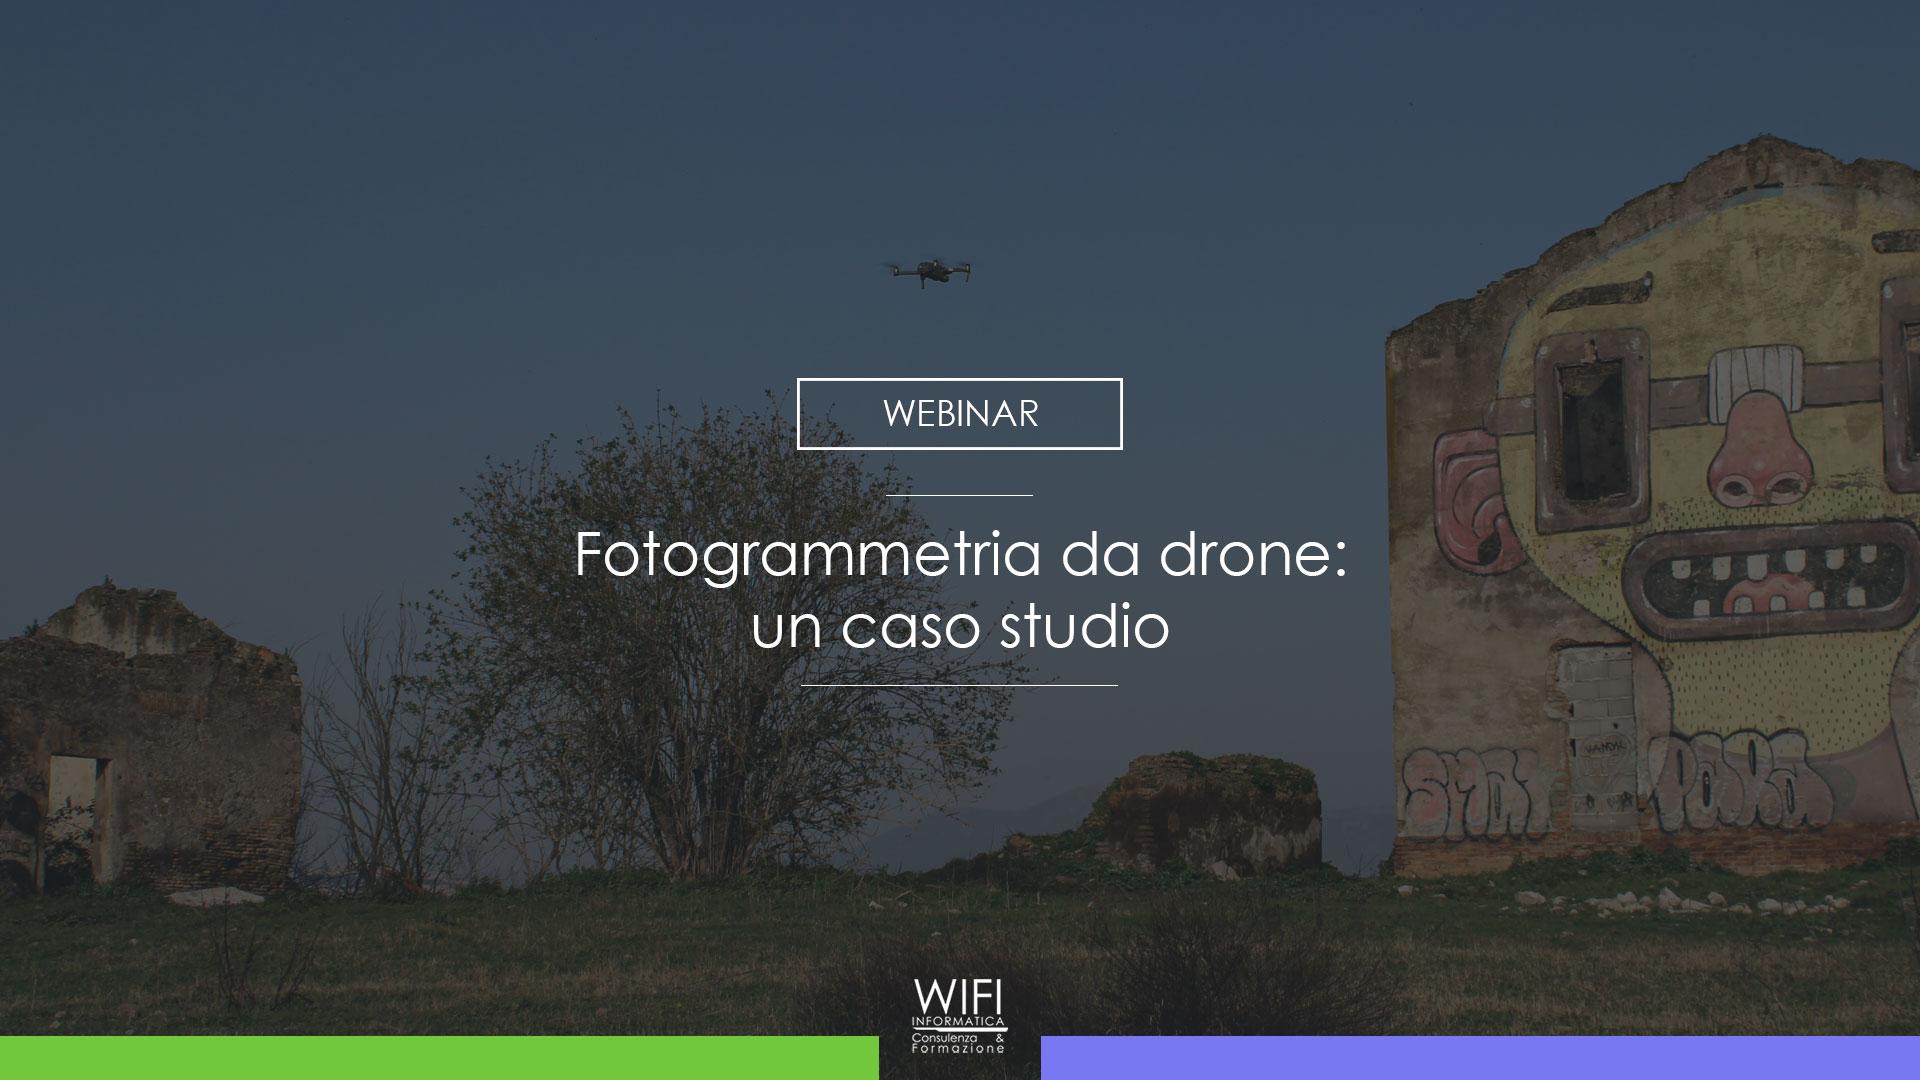 fotogrammetria-drone-caso-studio-webinar